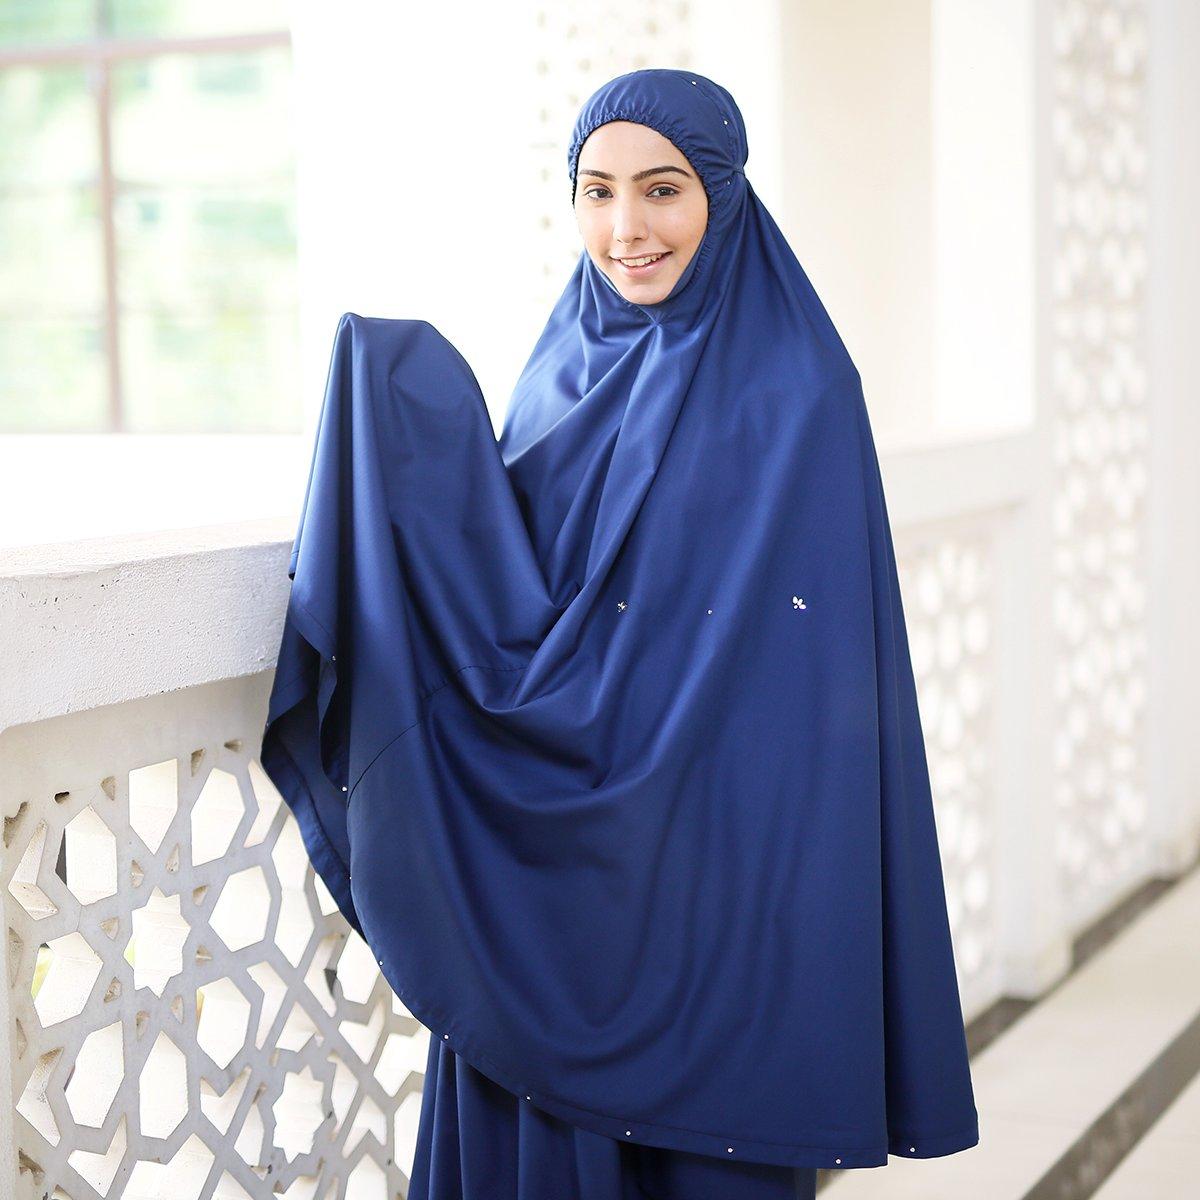 Crystal Swarovski Limited Edition Padanan Warna Biru Dihiasi Butiran Menampilkan Elemen Ringkas Namun